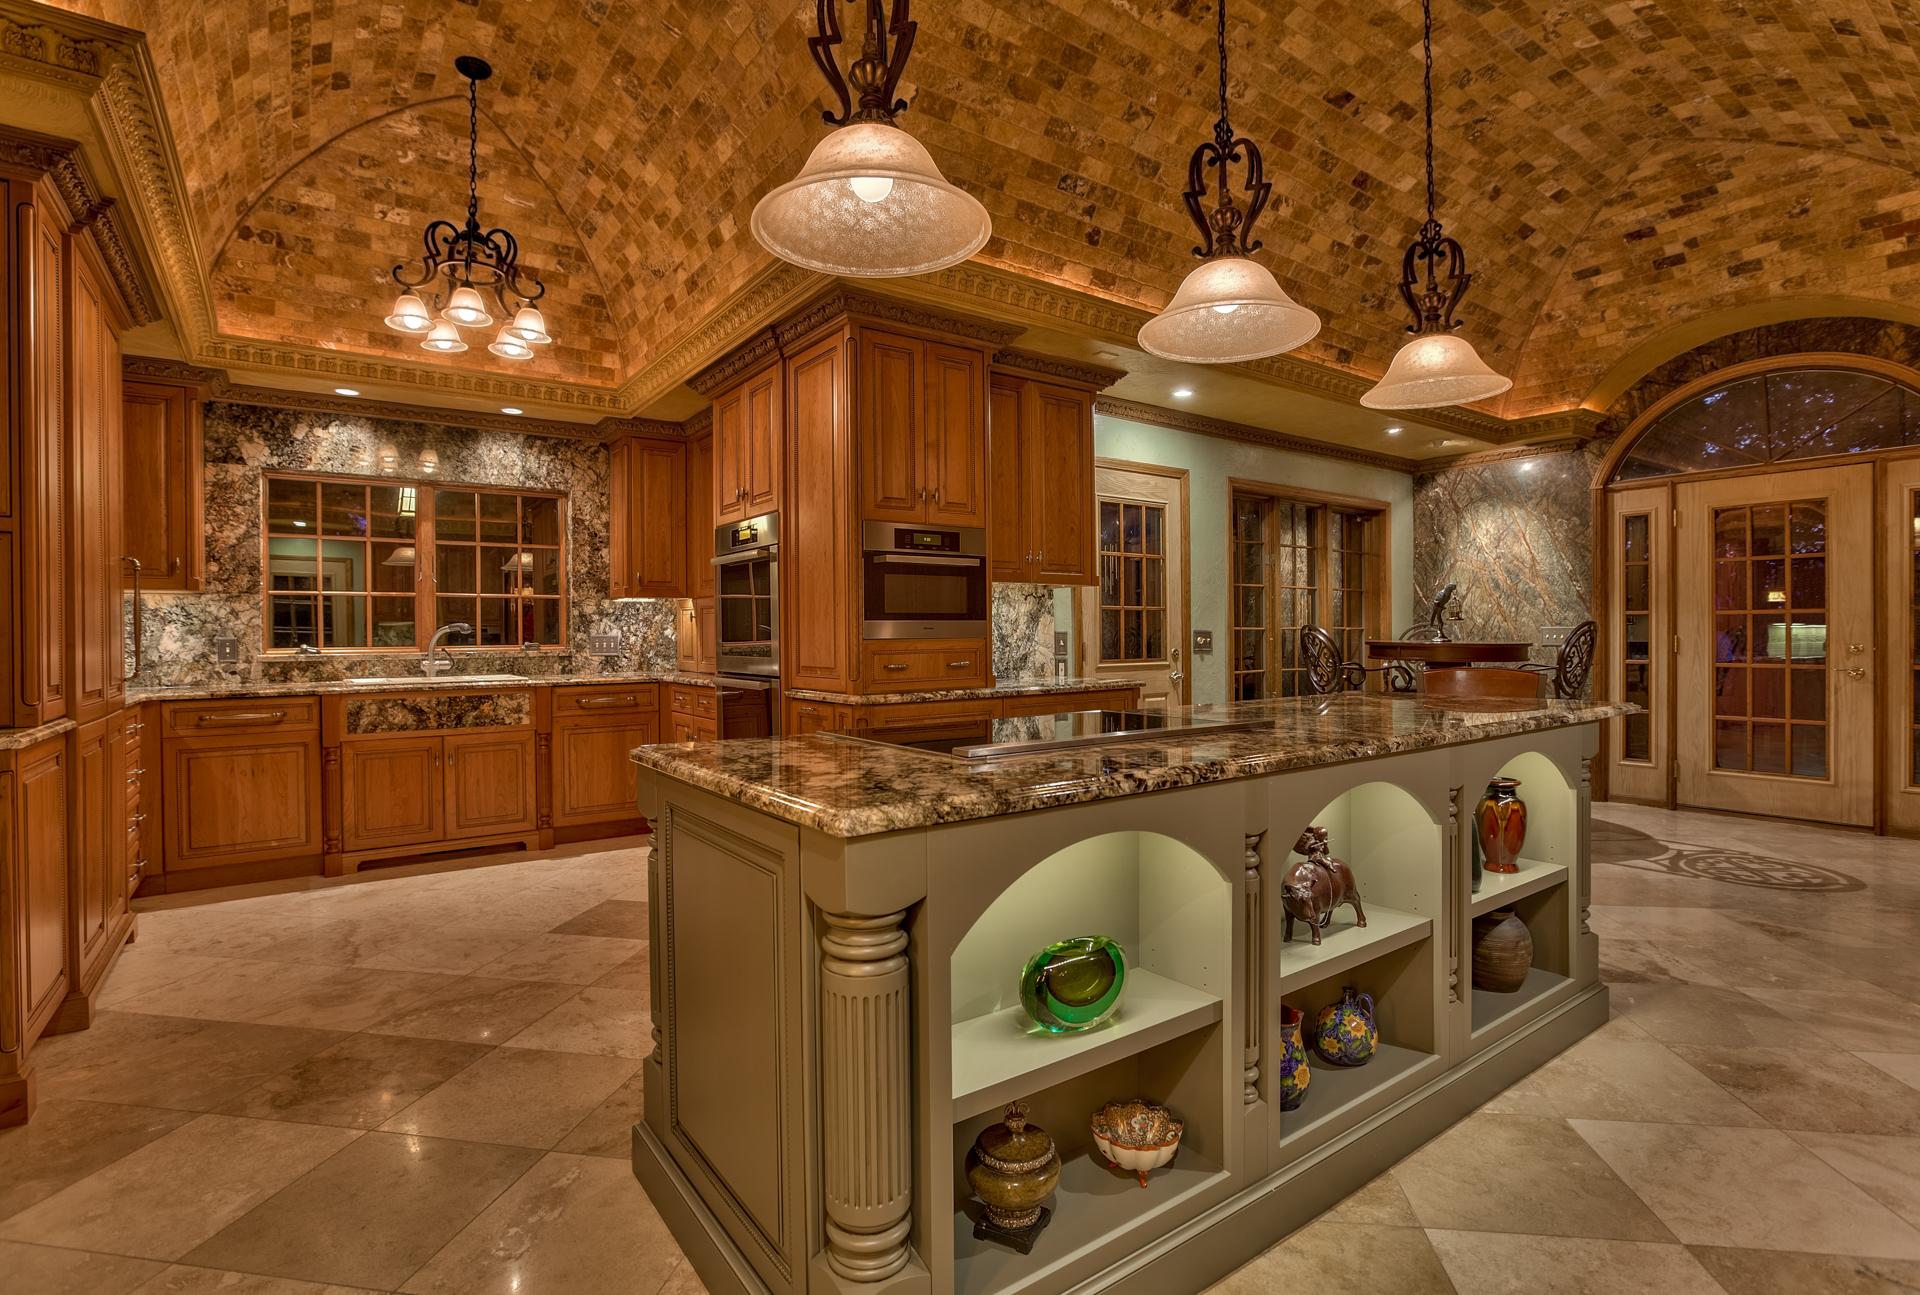 Old World Kitchen- Council Bluffs IA